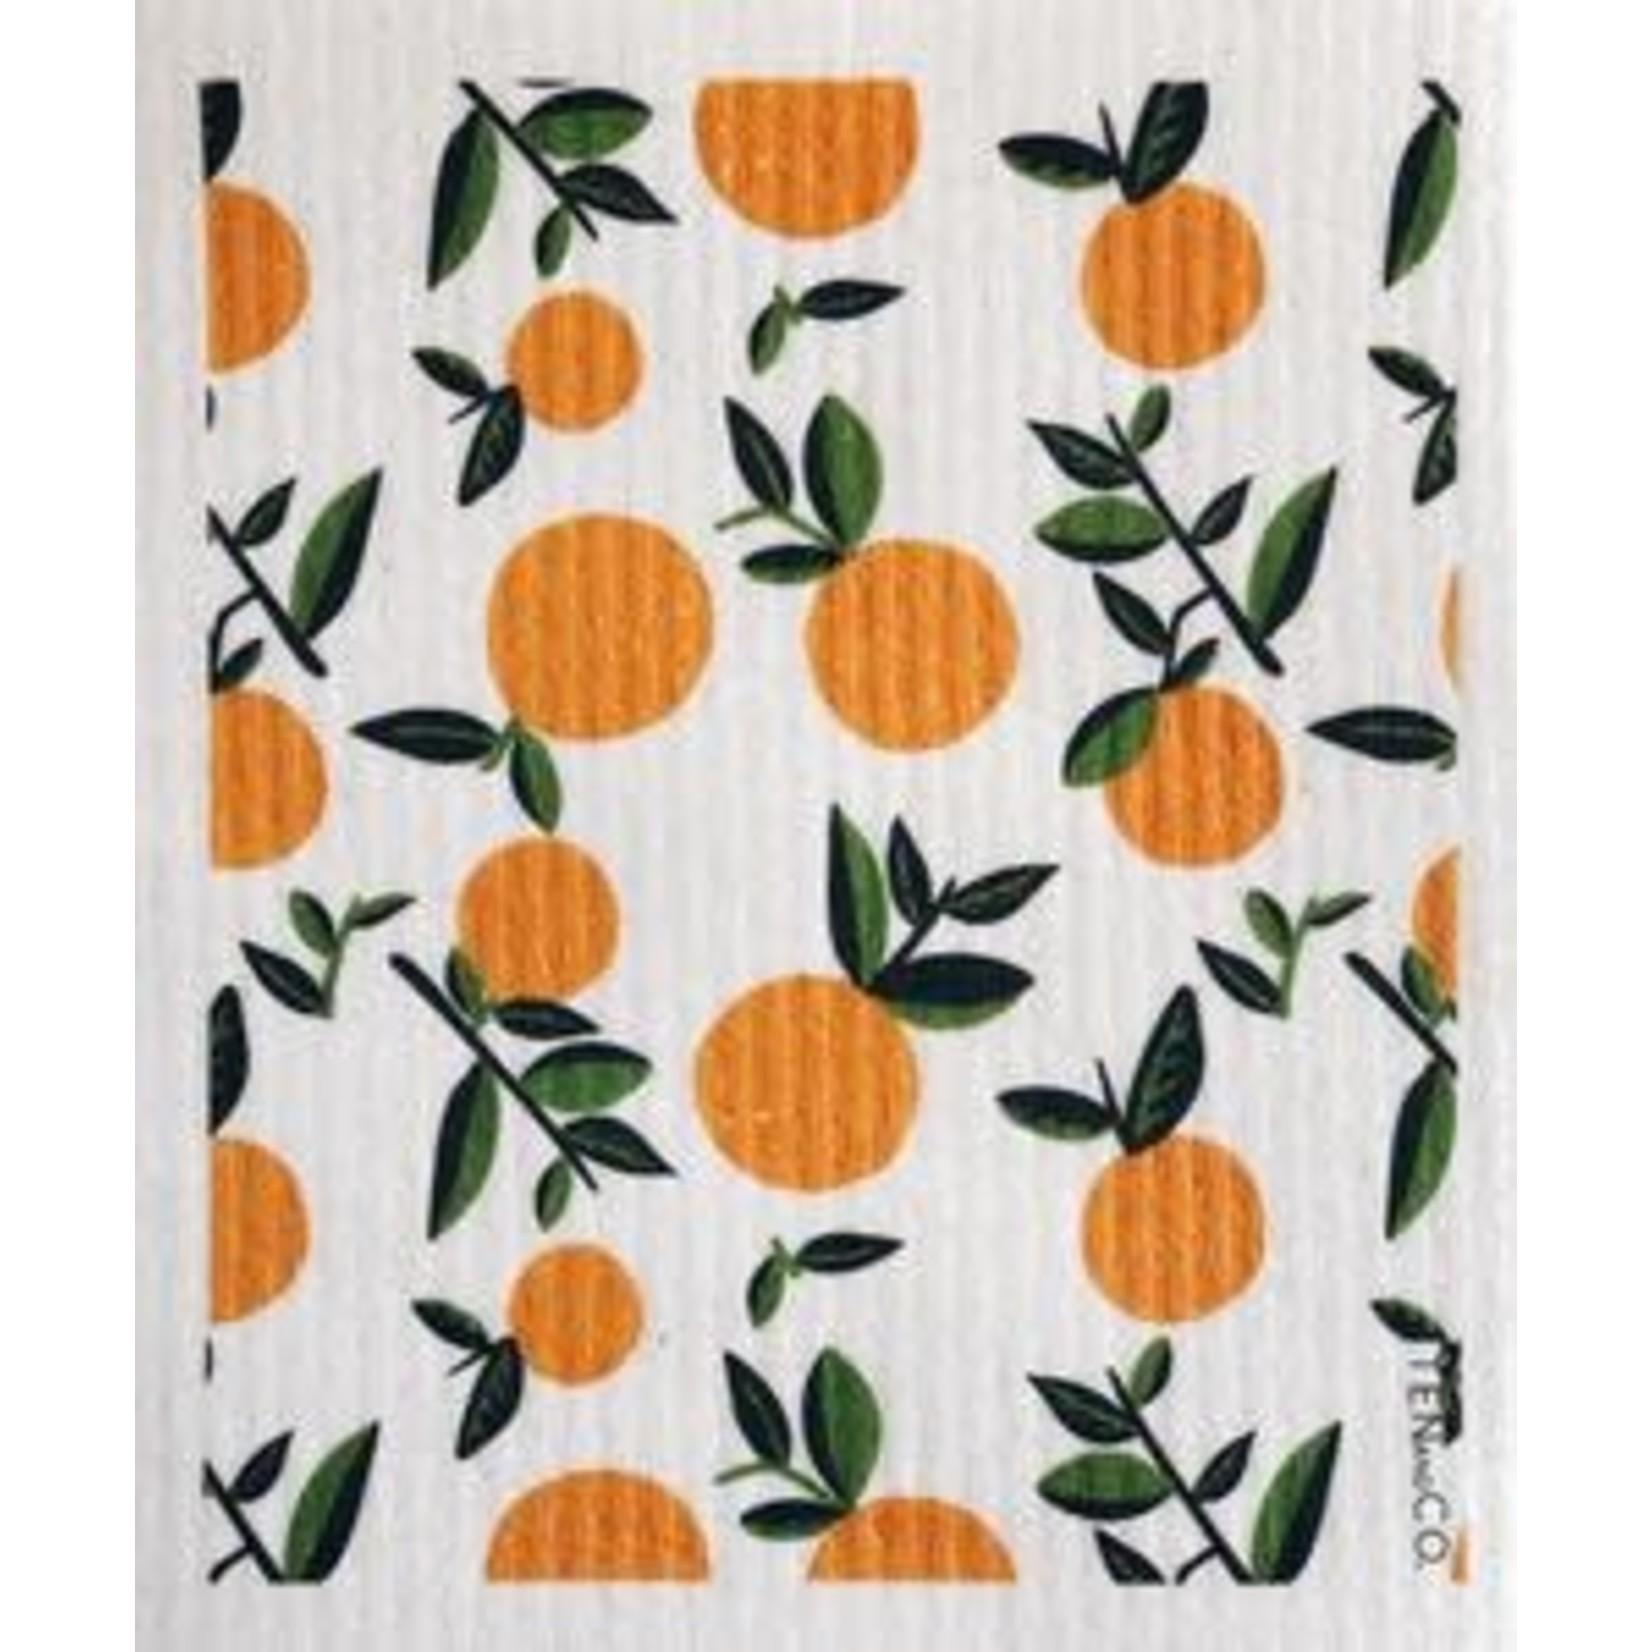 TEN AND CO. Sponge Cloth Citrus Orange